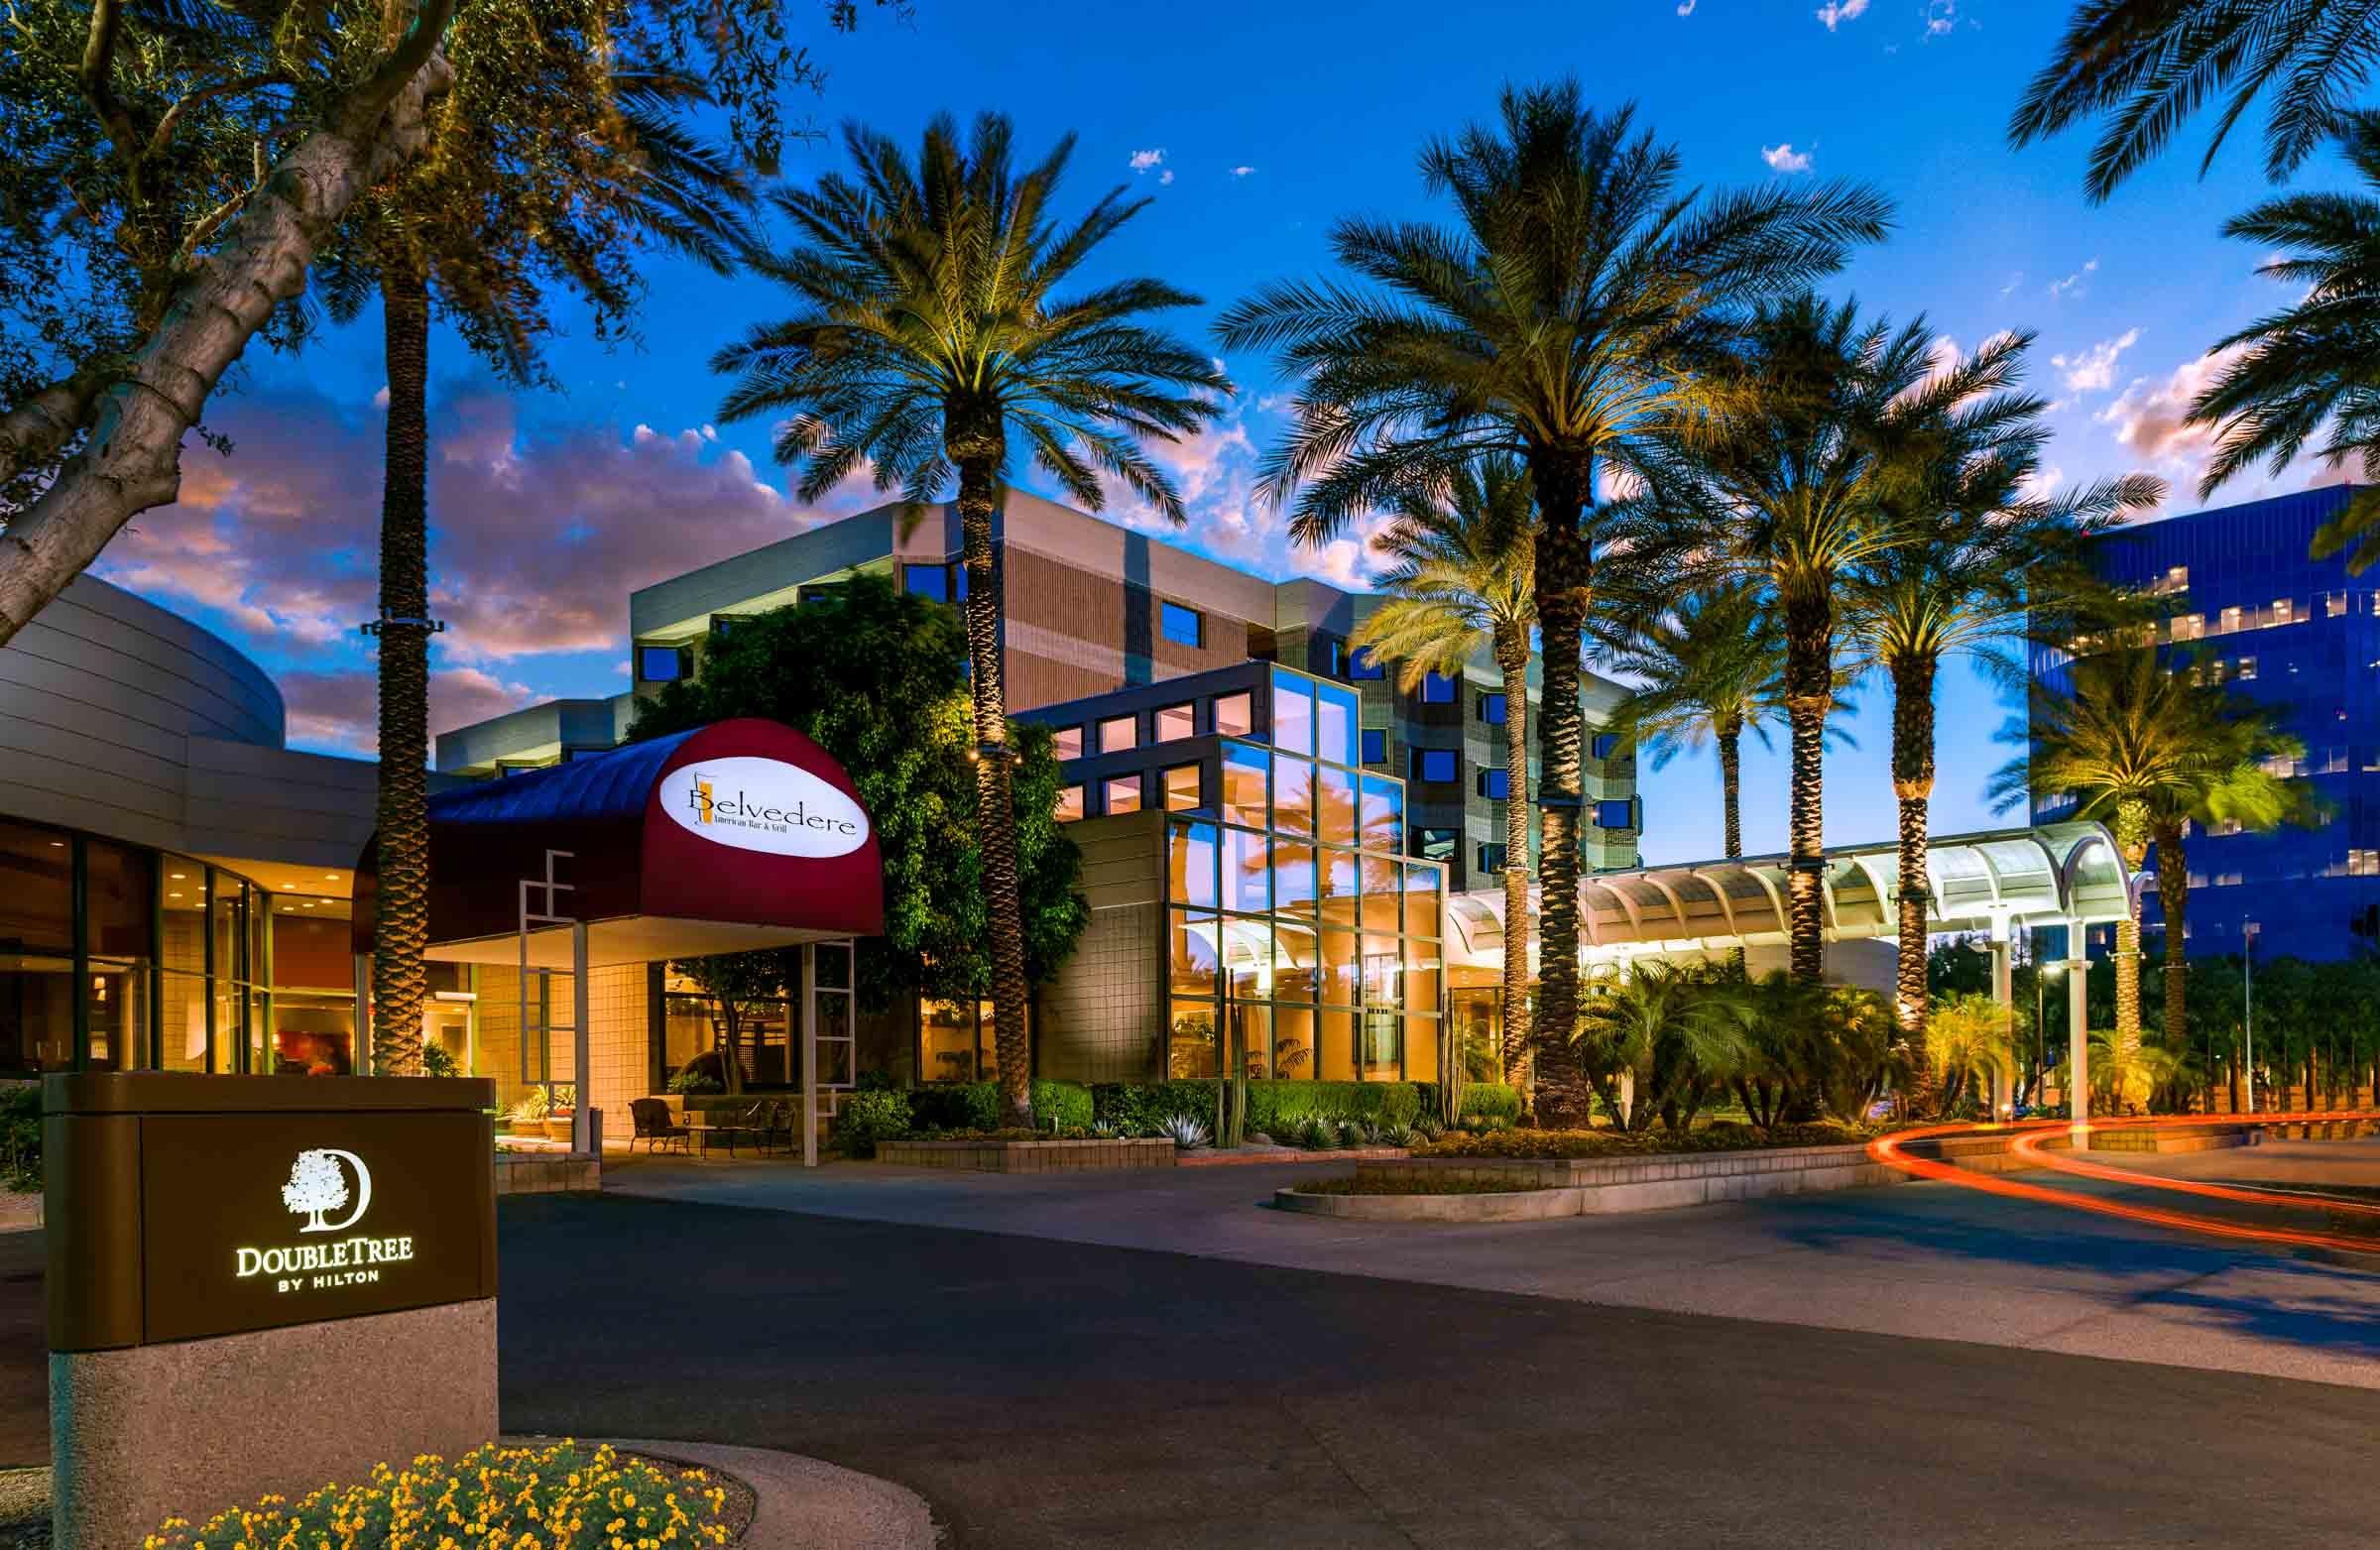 DoubleTree Suites by Hilton Hotel Phoenix image 0